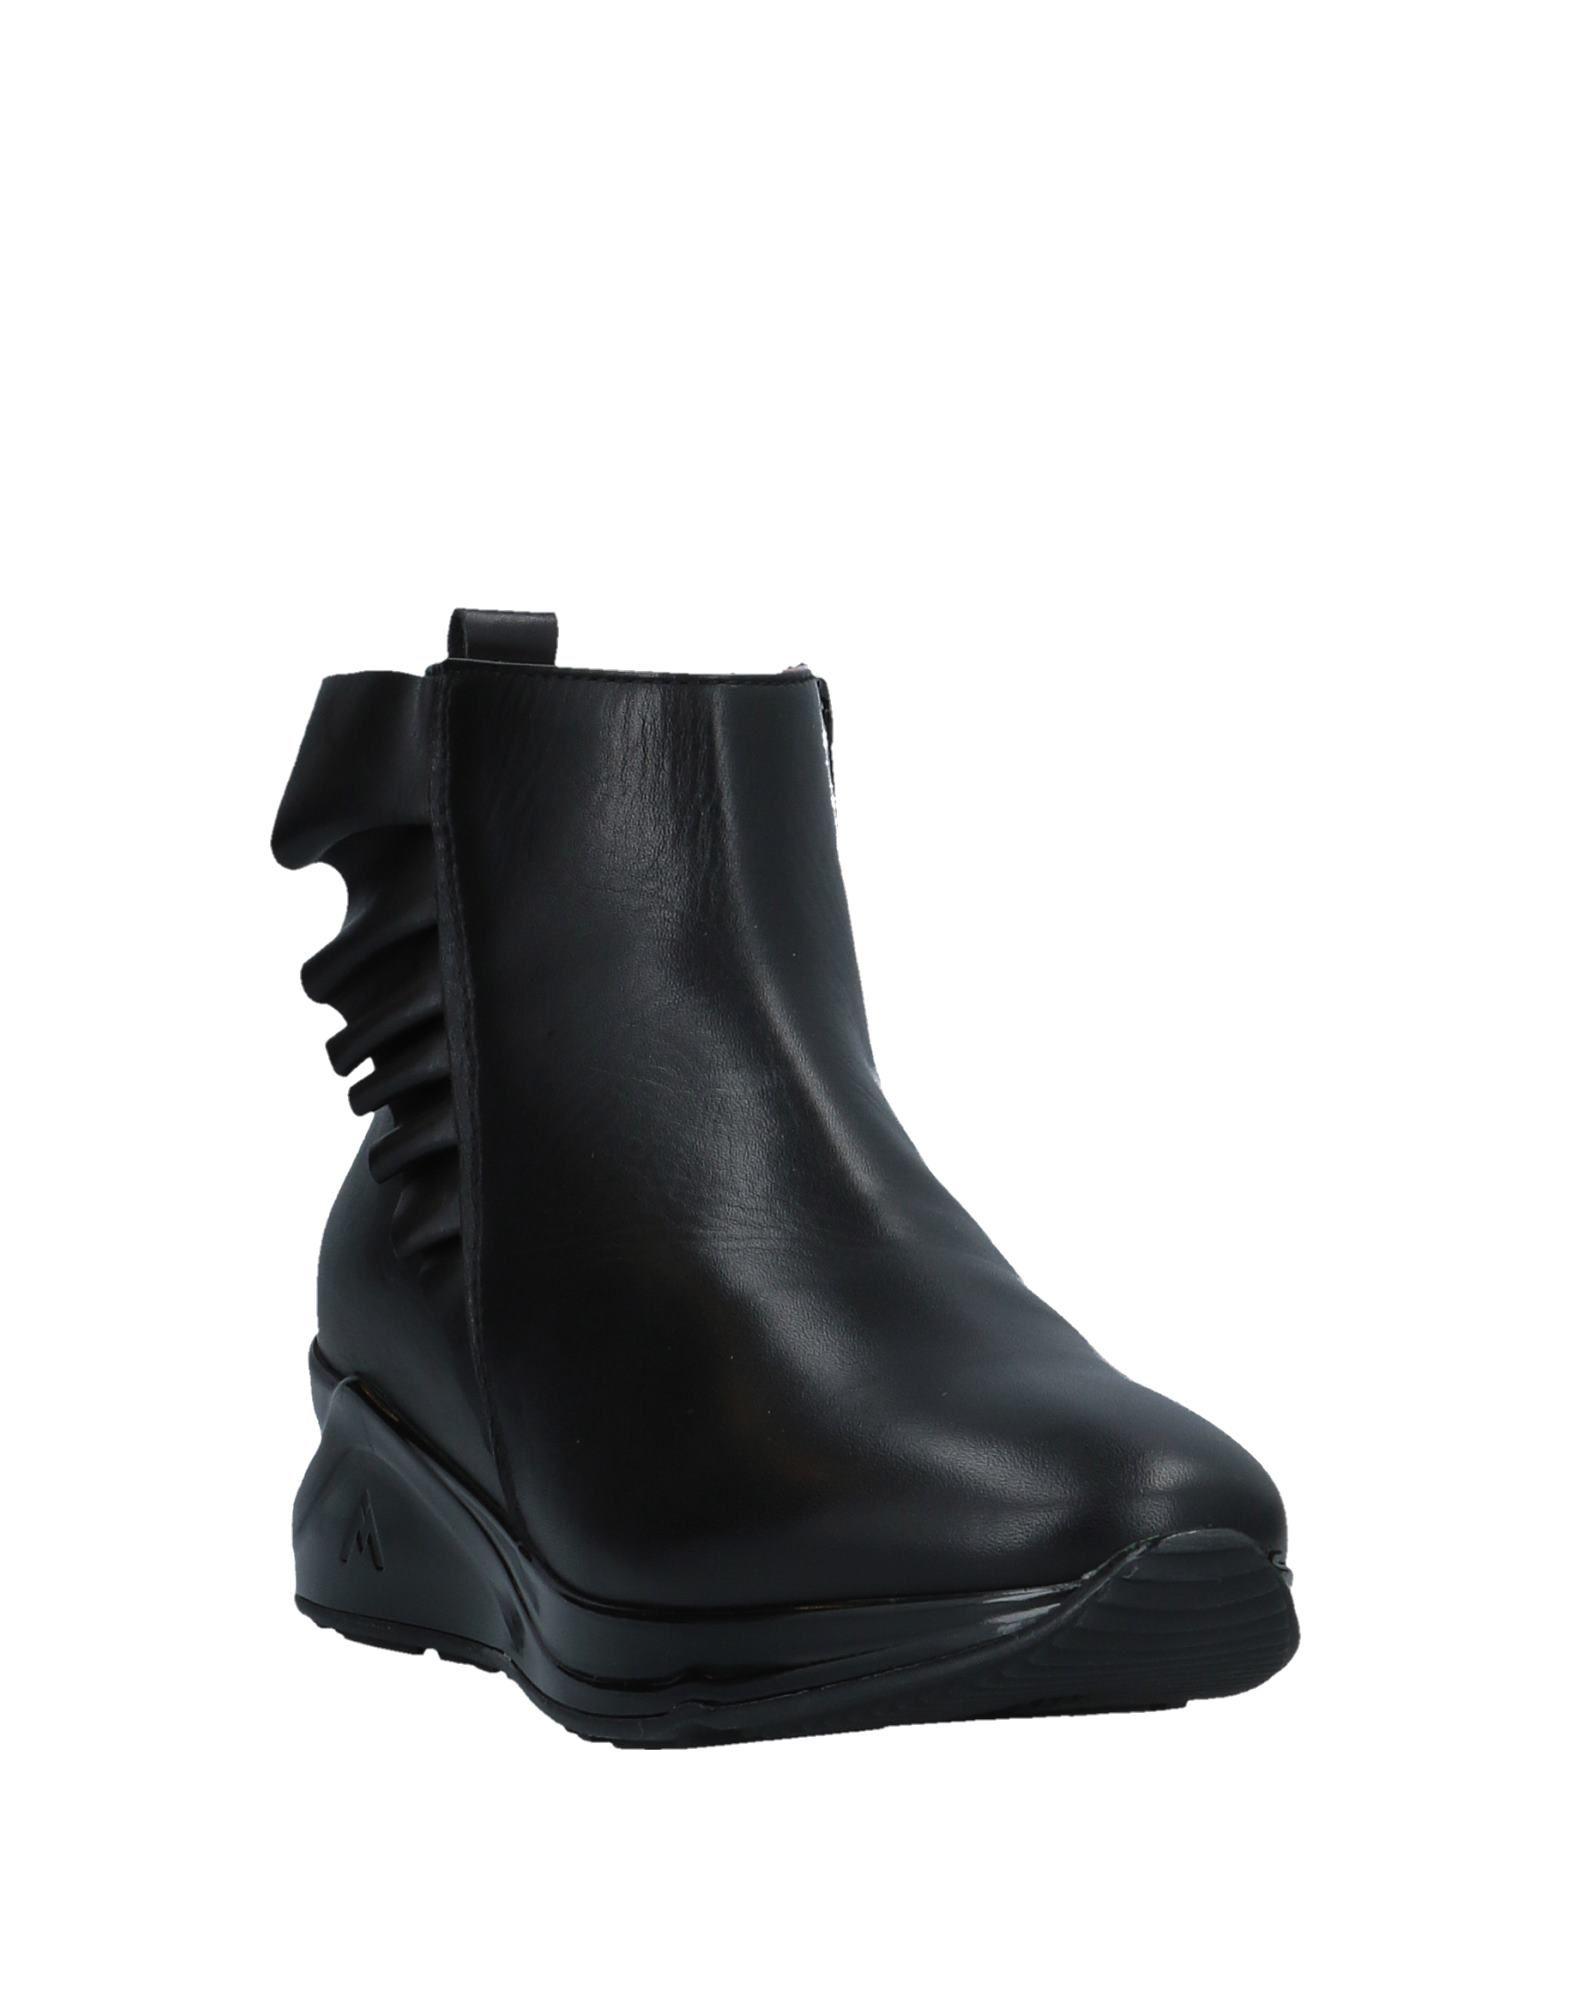 Andrea Morelli Stiefelette Damen beliebte  11540605AQ Gute Qualität beliebte Damen Schuhe 81af3b